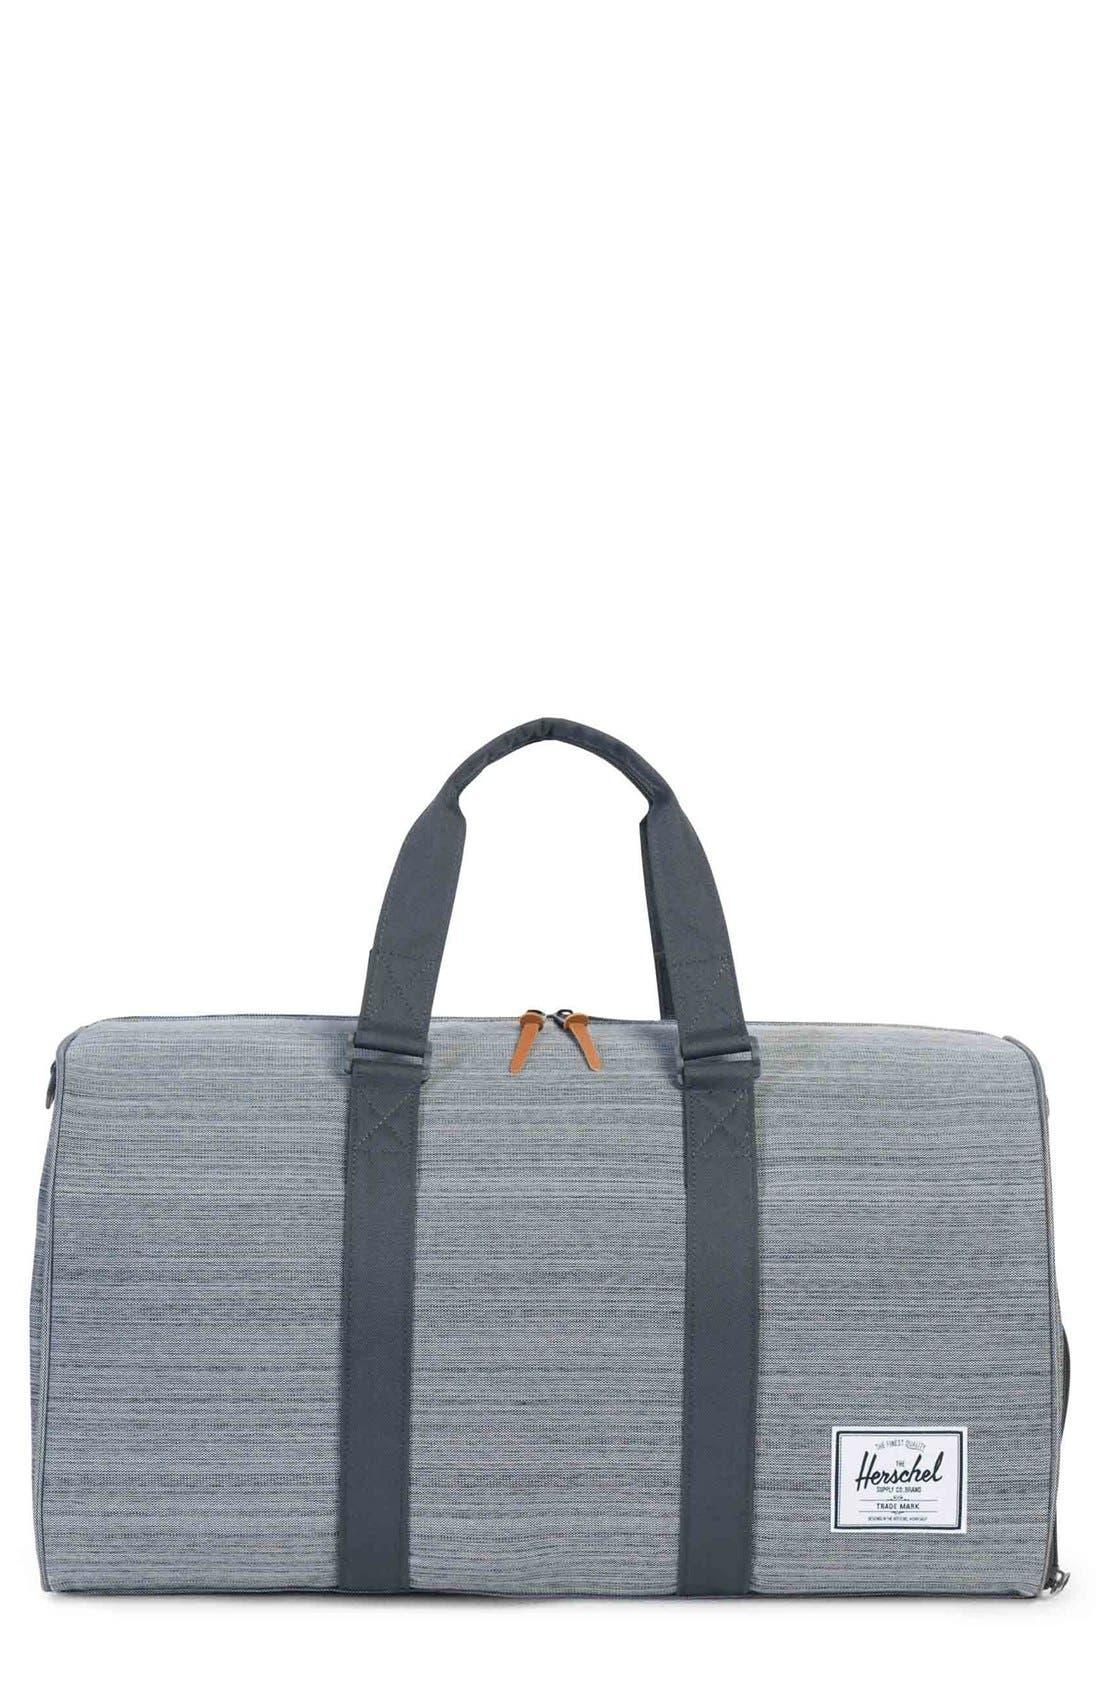 Novel Duffel Bag,                         Main,                         color, 016